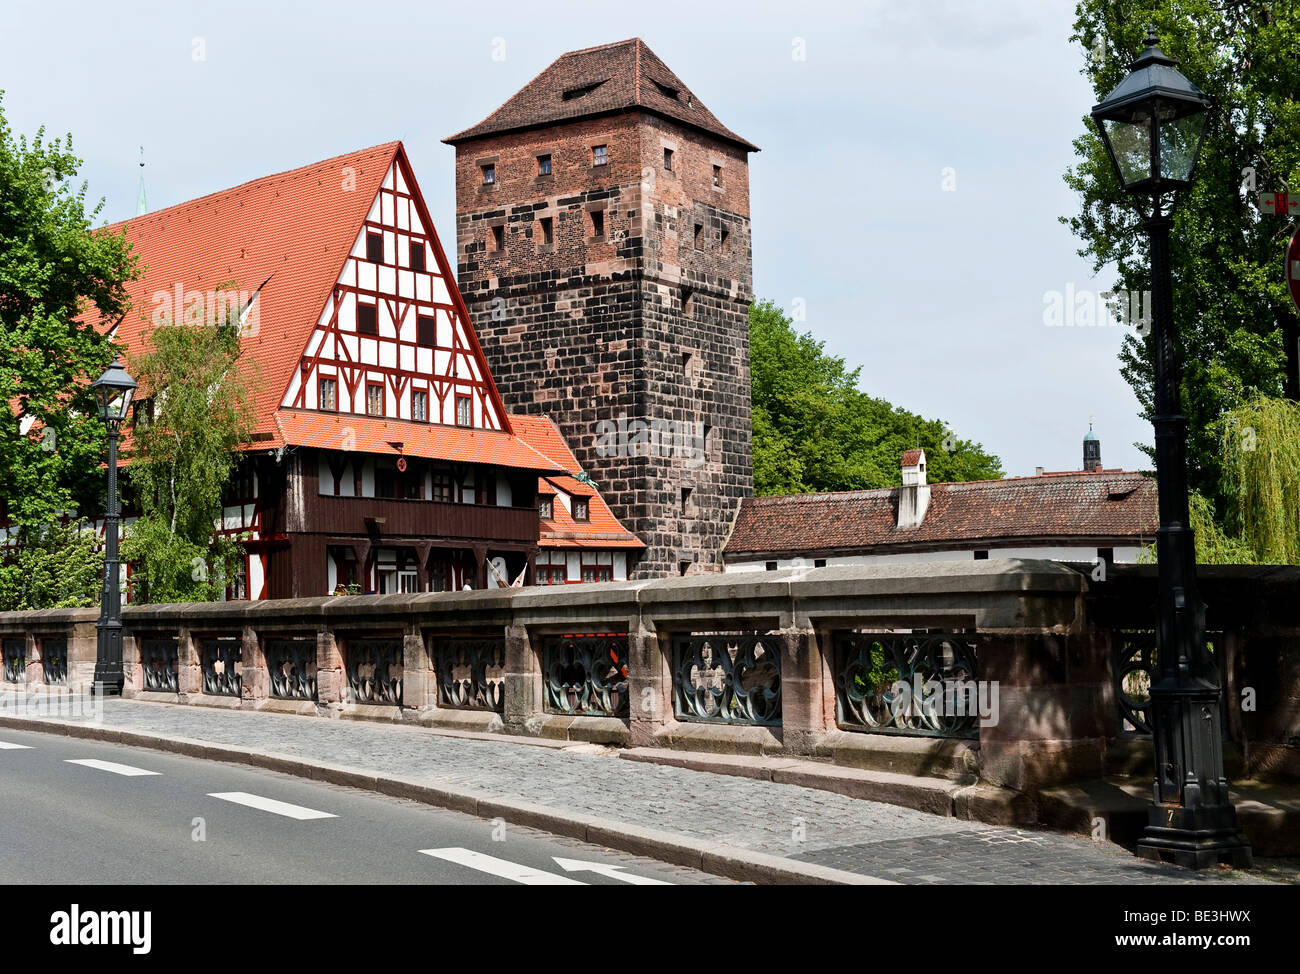 Pegnitz river with Maxbruecke bridge, Weinstadel building, Henkersteg executioner path in front of the historic - Stock Image